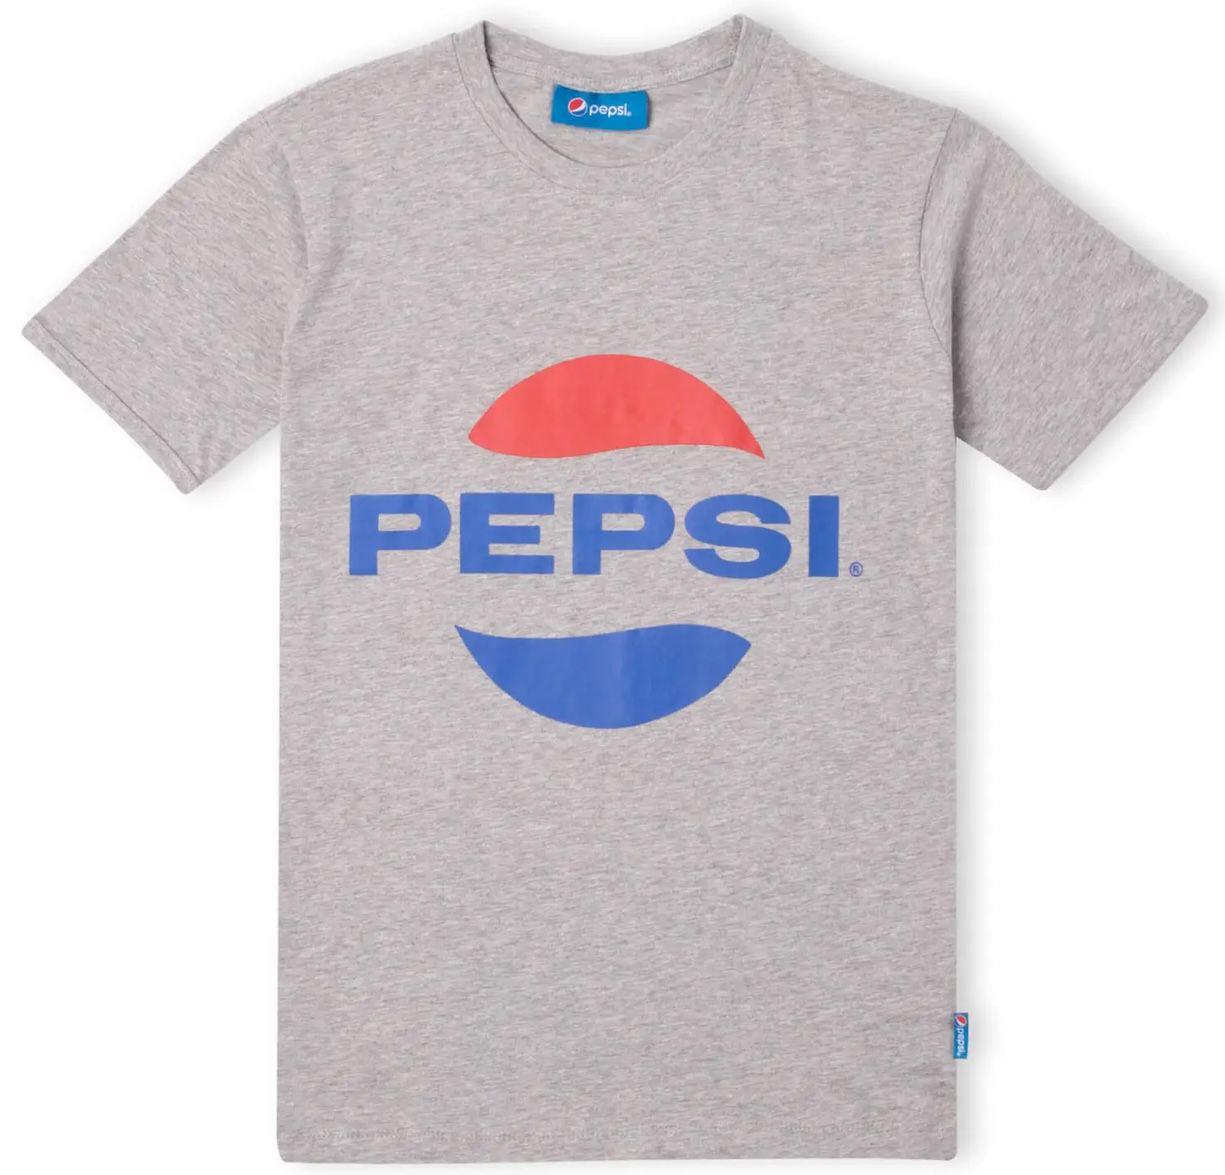 Pepsi Logo Herren T Shirt für 8,99€ (statt 21€)